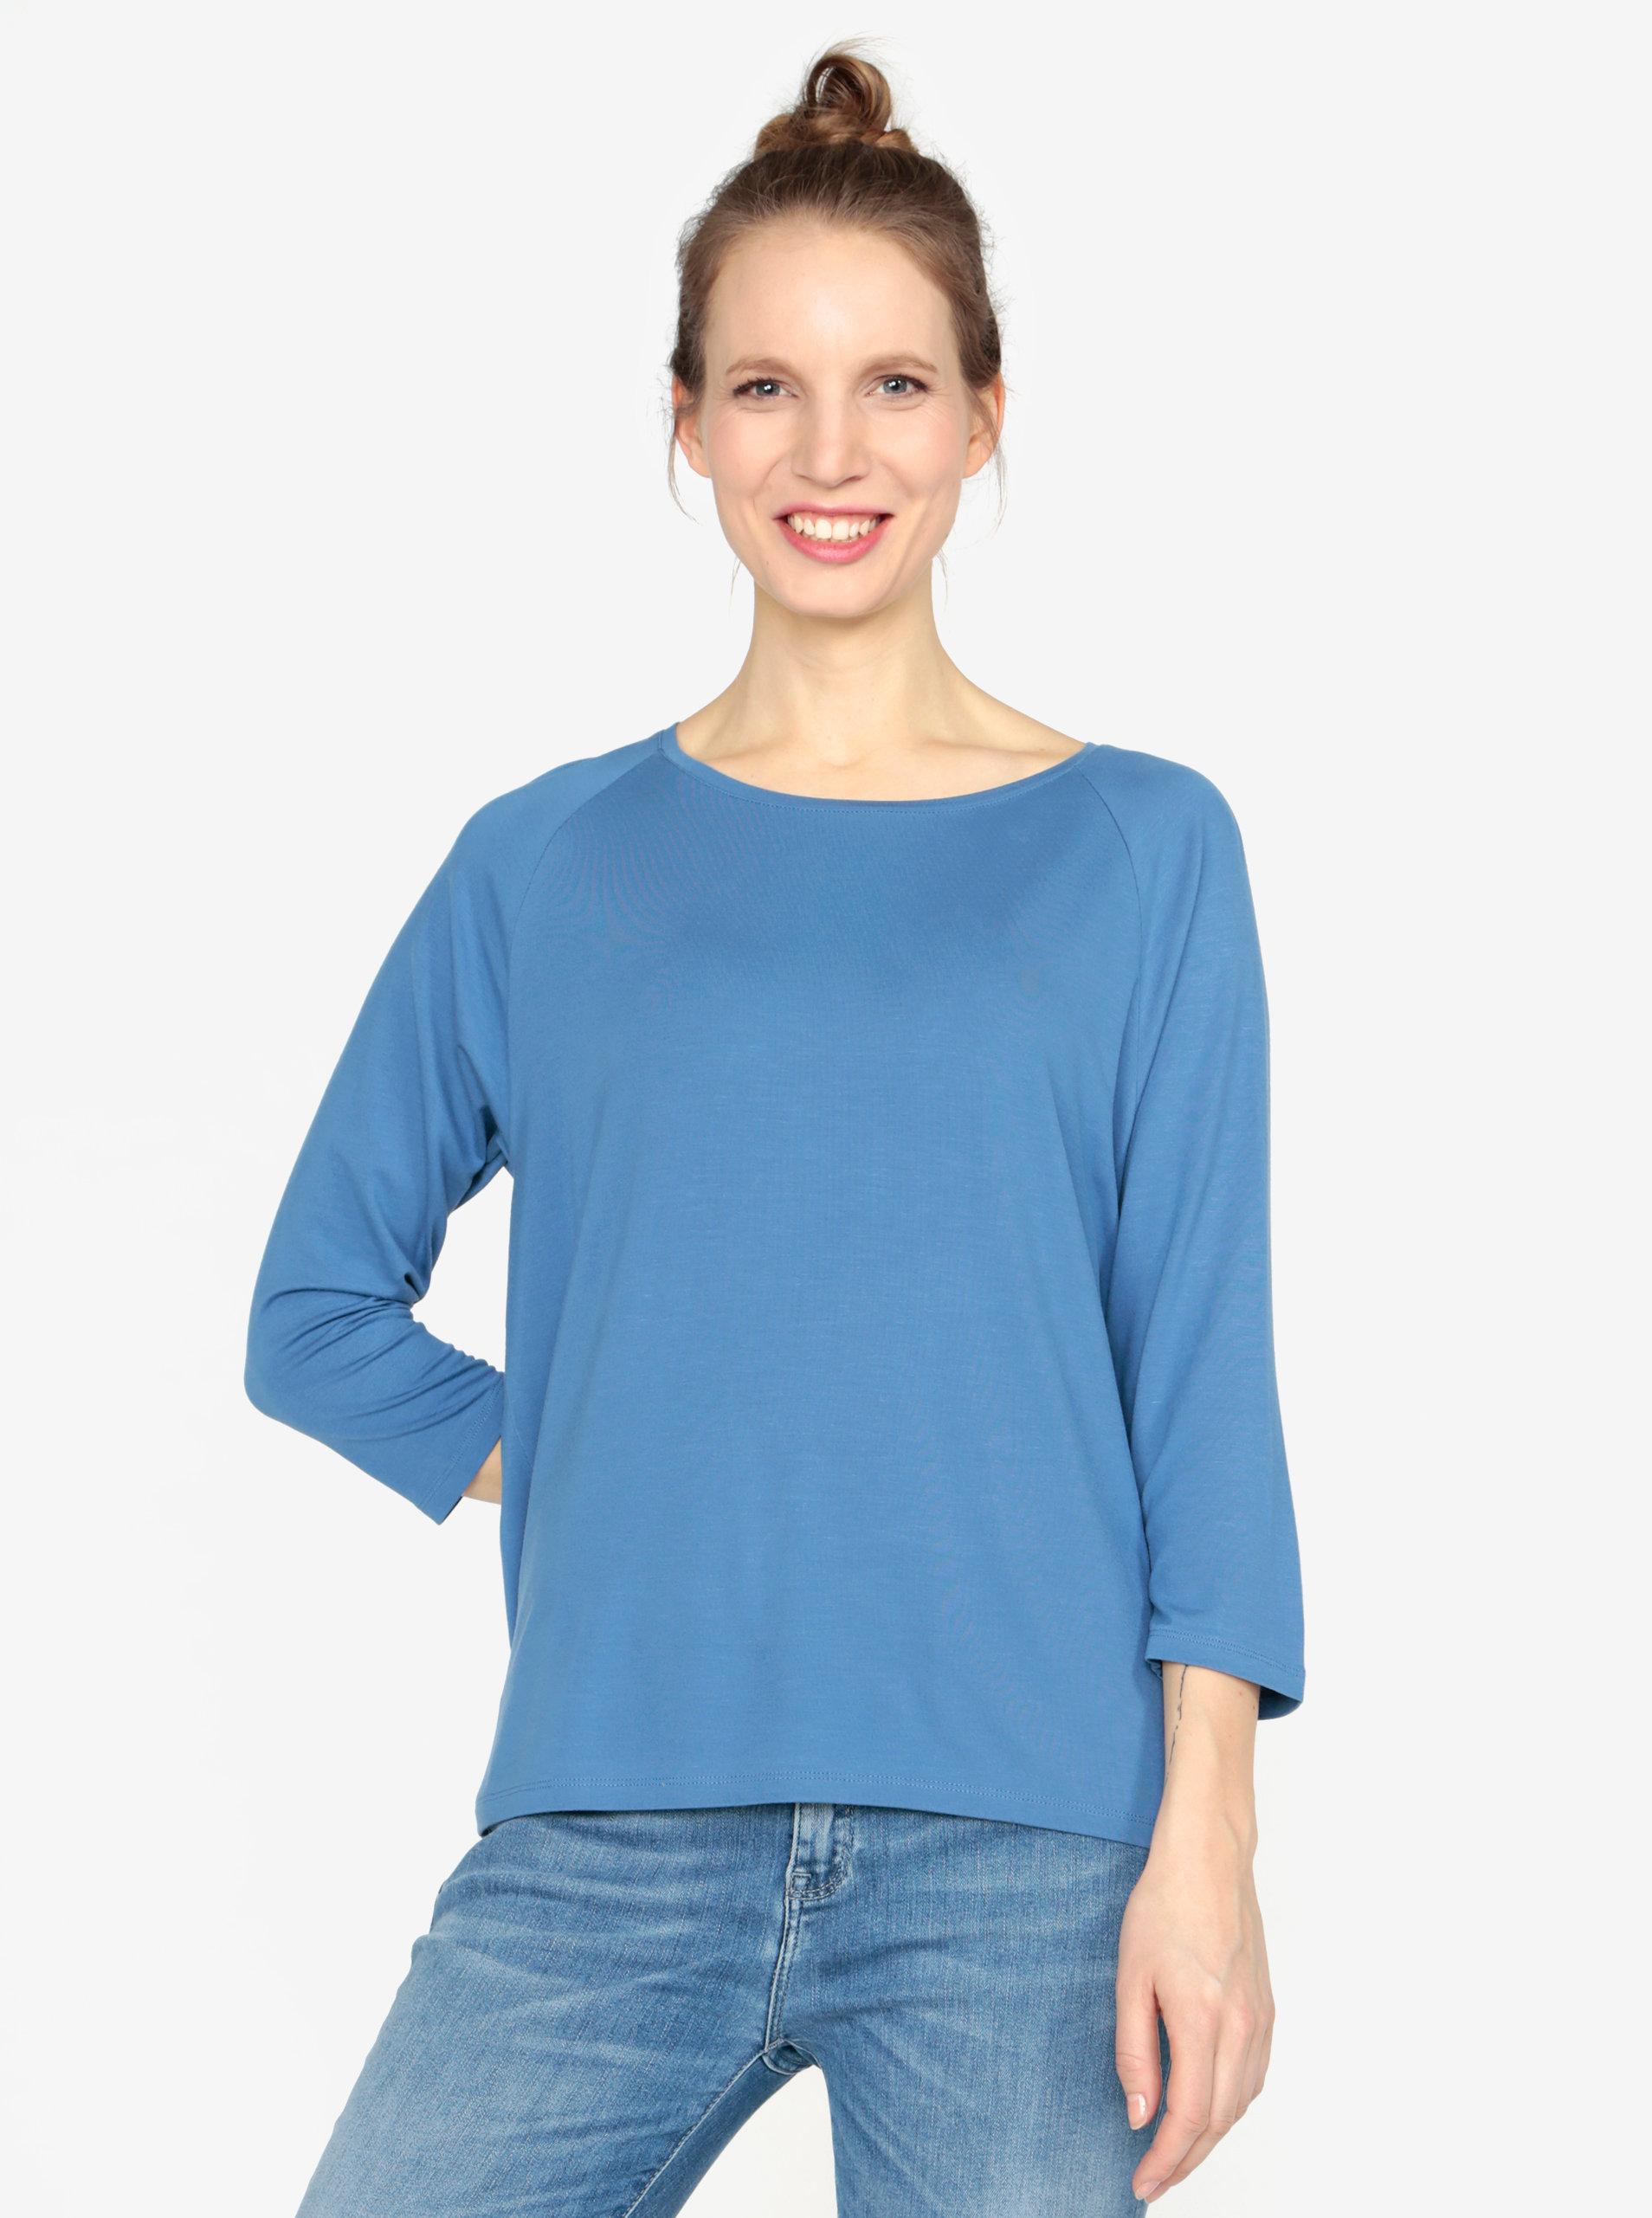 Modré tričko s 3 4 rukávom Tommy Hilfiger ... 7c6b1868aed